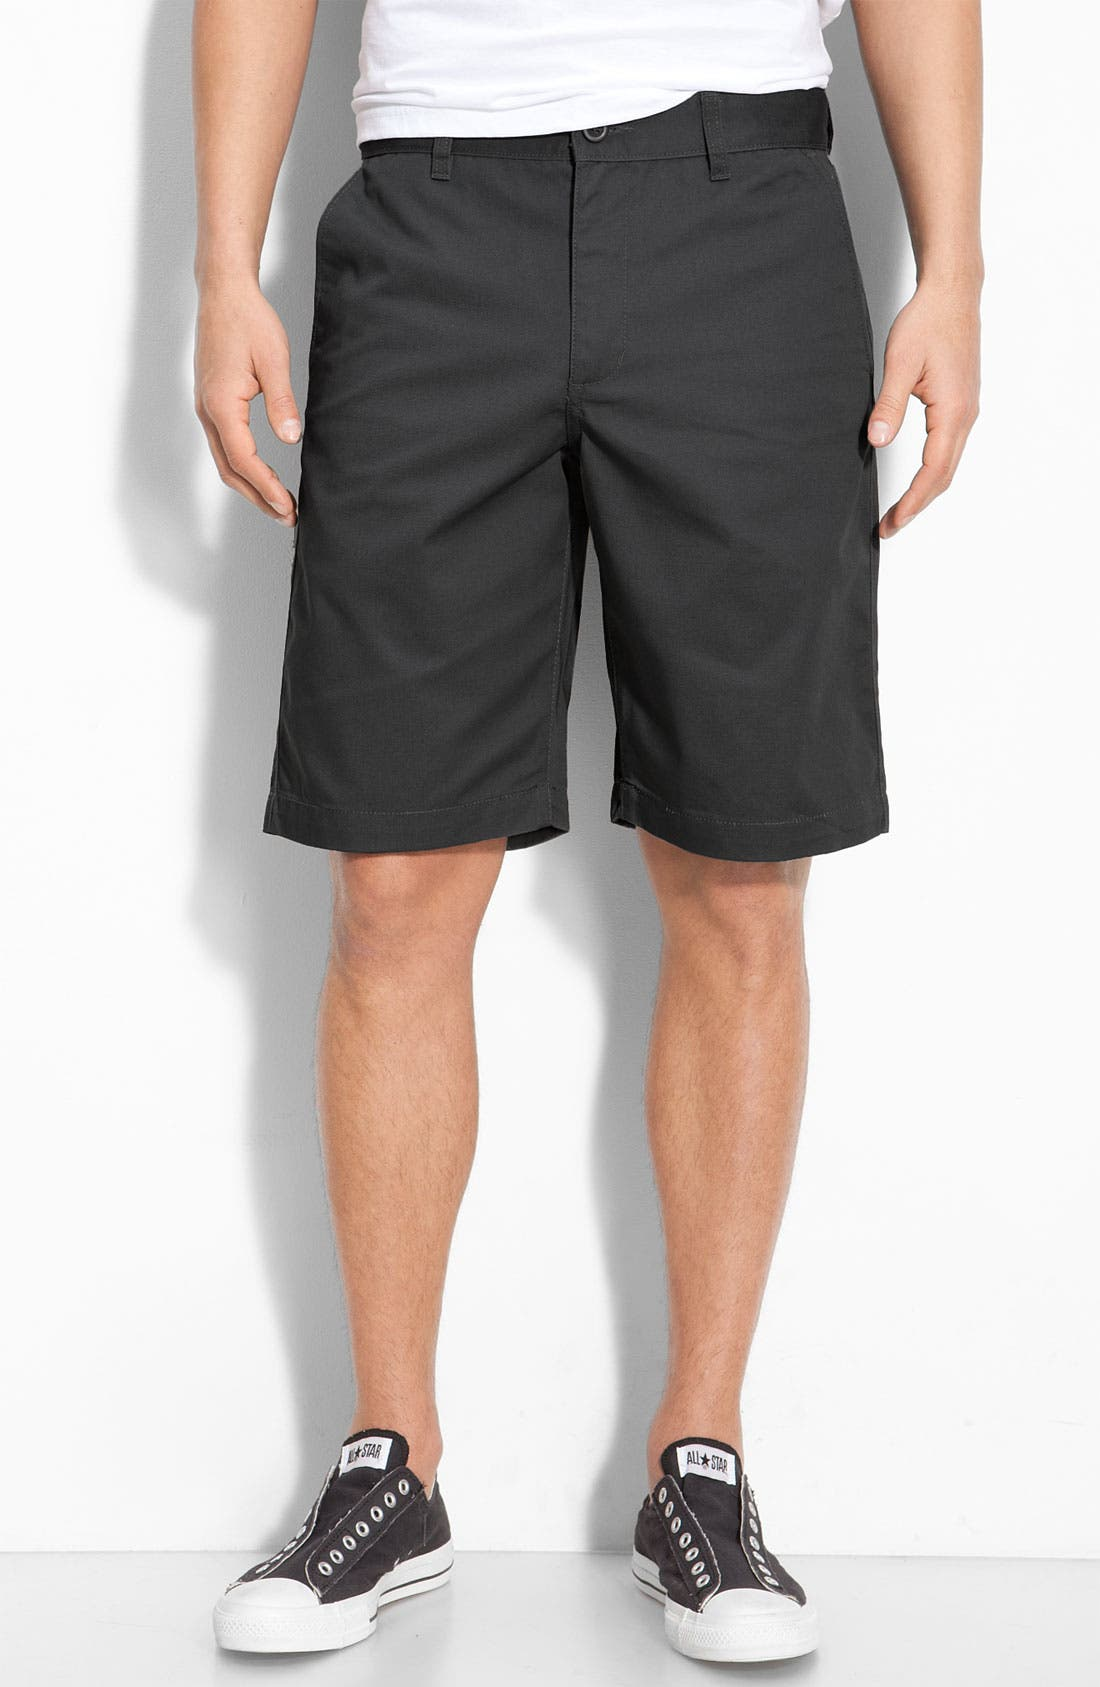 Alternate Image 1 Selected - RVCA 'Americana' Shorts